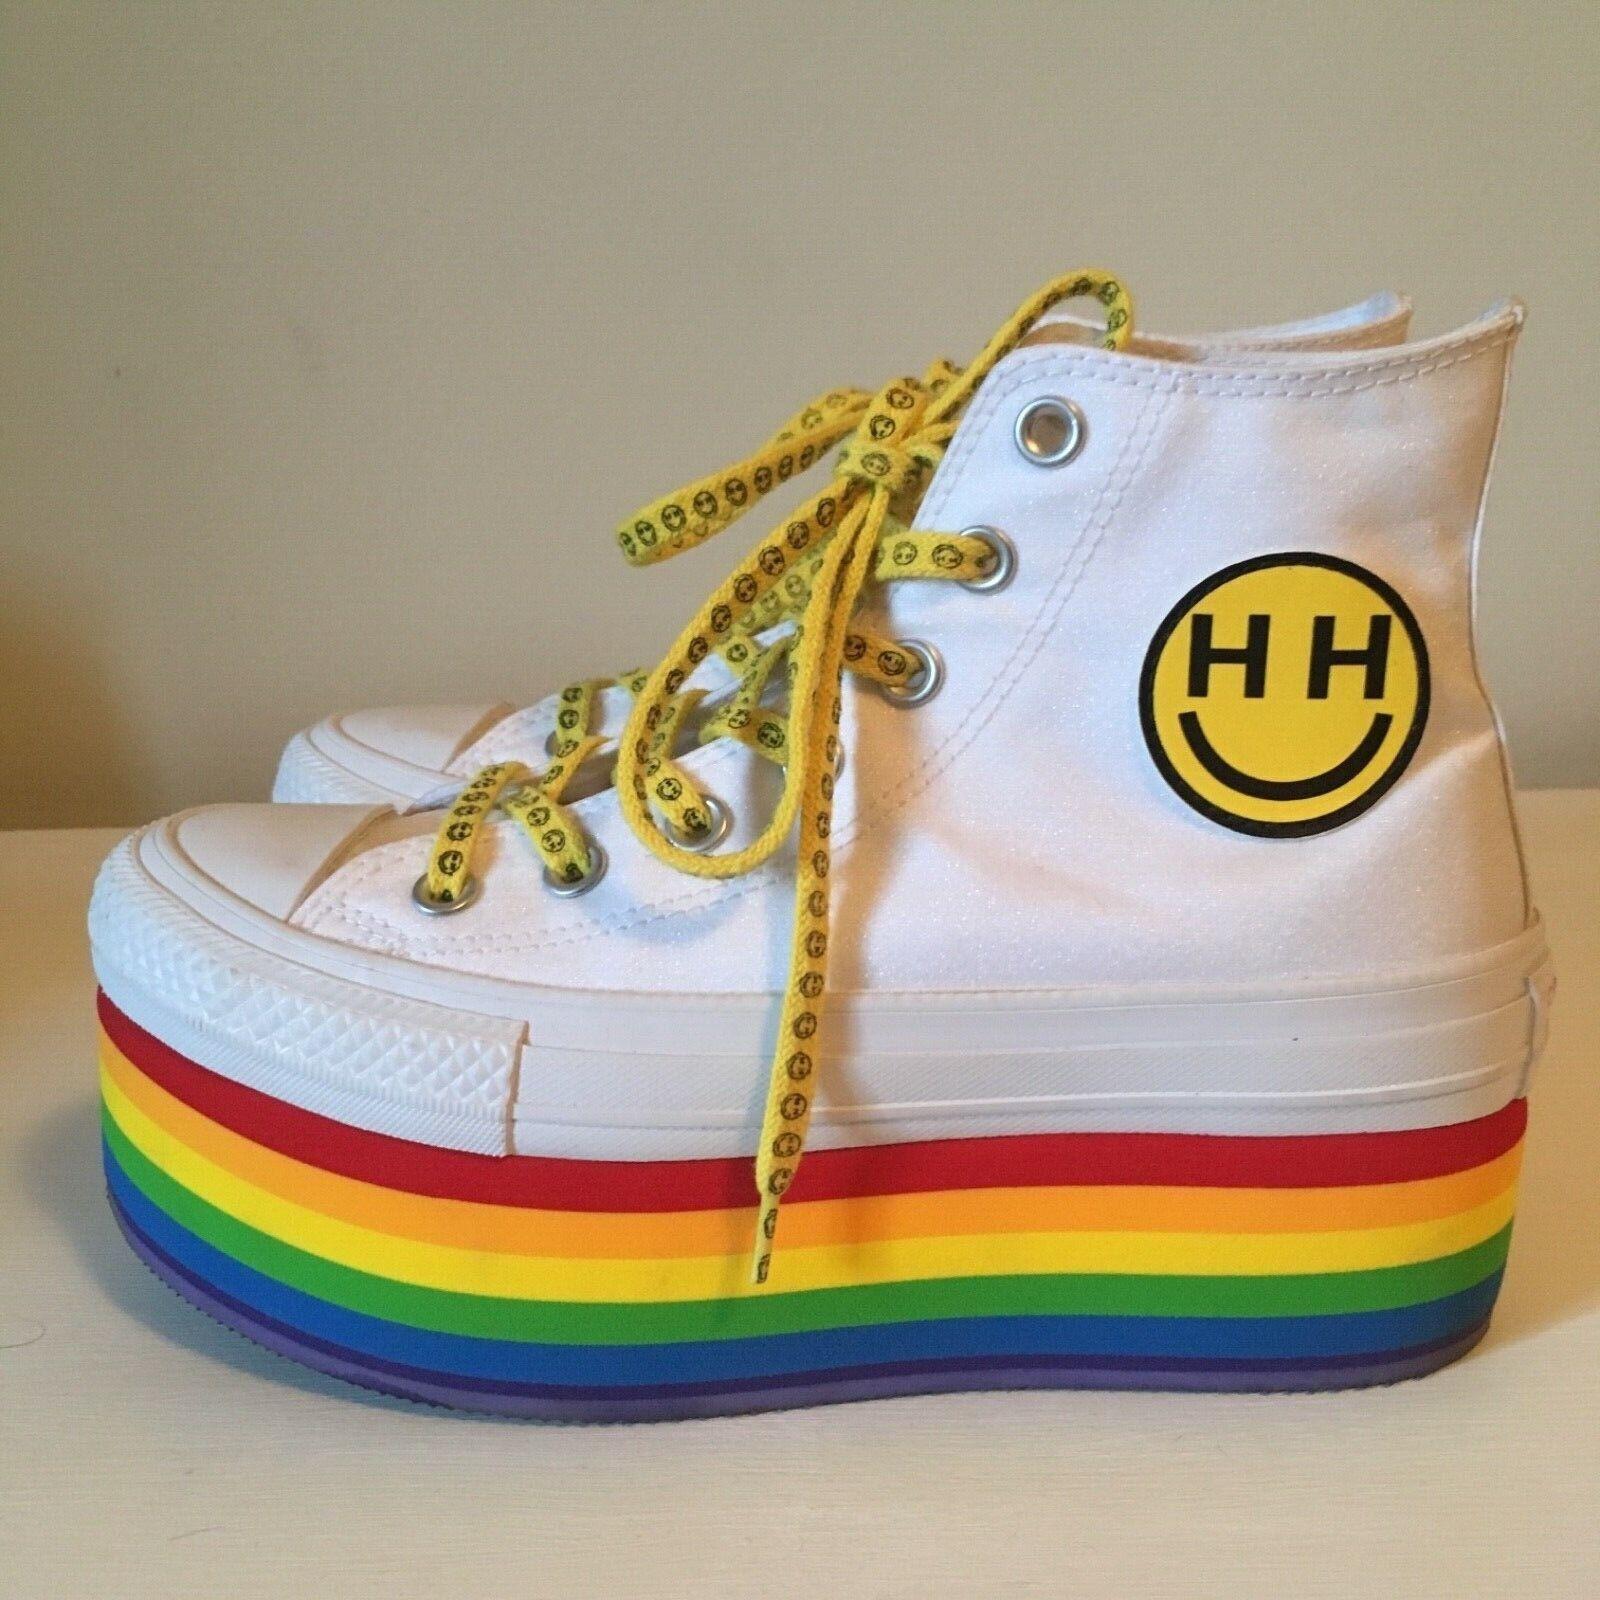 Converse x Miley Cyrus rainbow pride platform shoes boots US 6.5-7